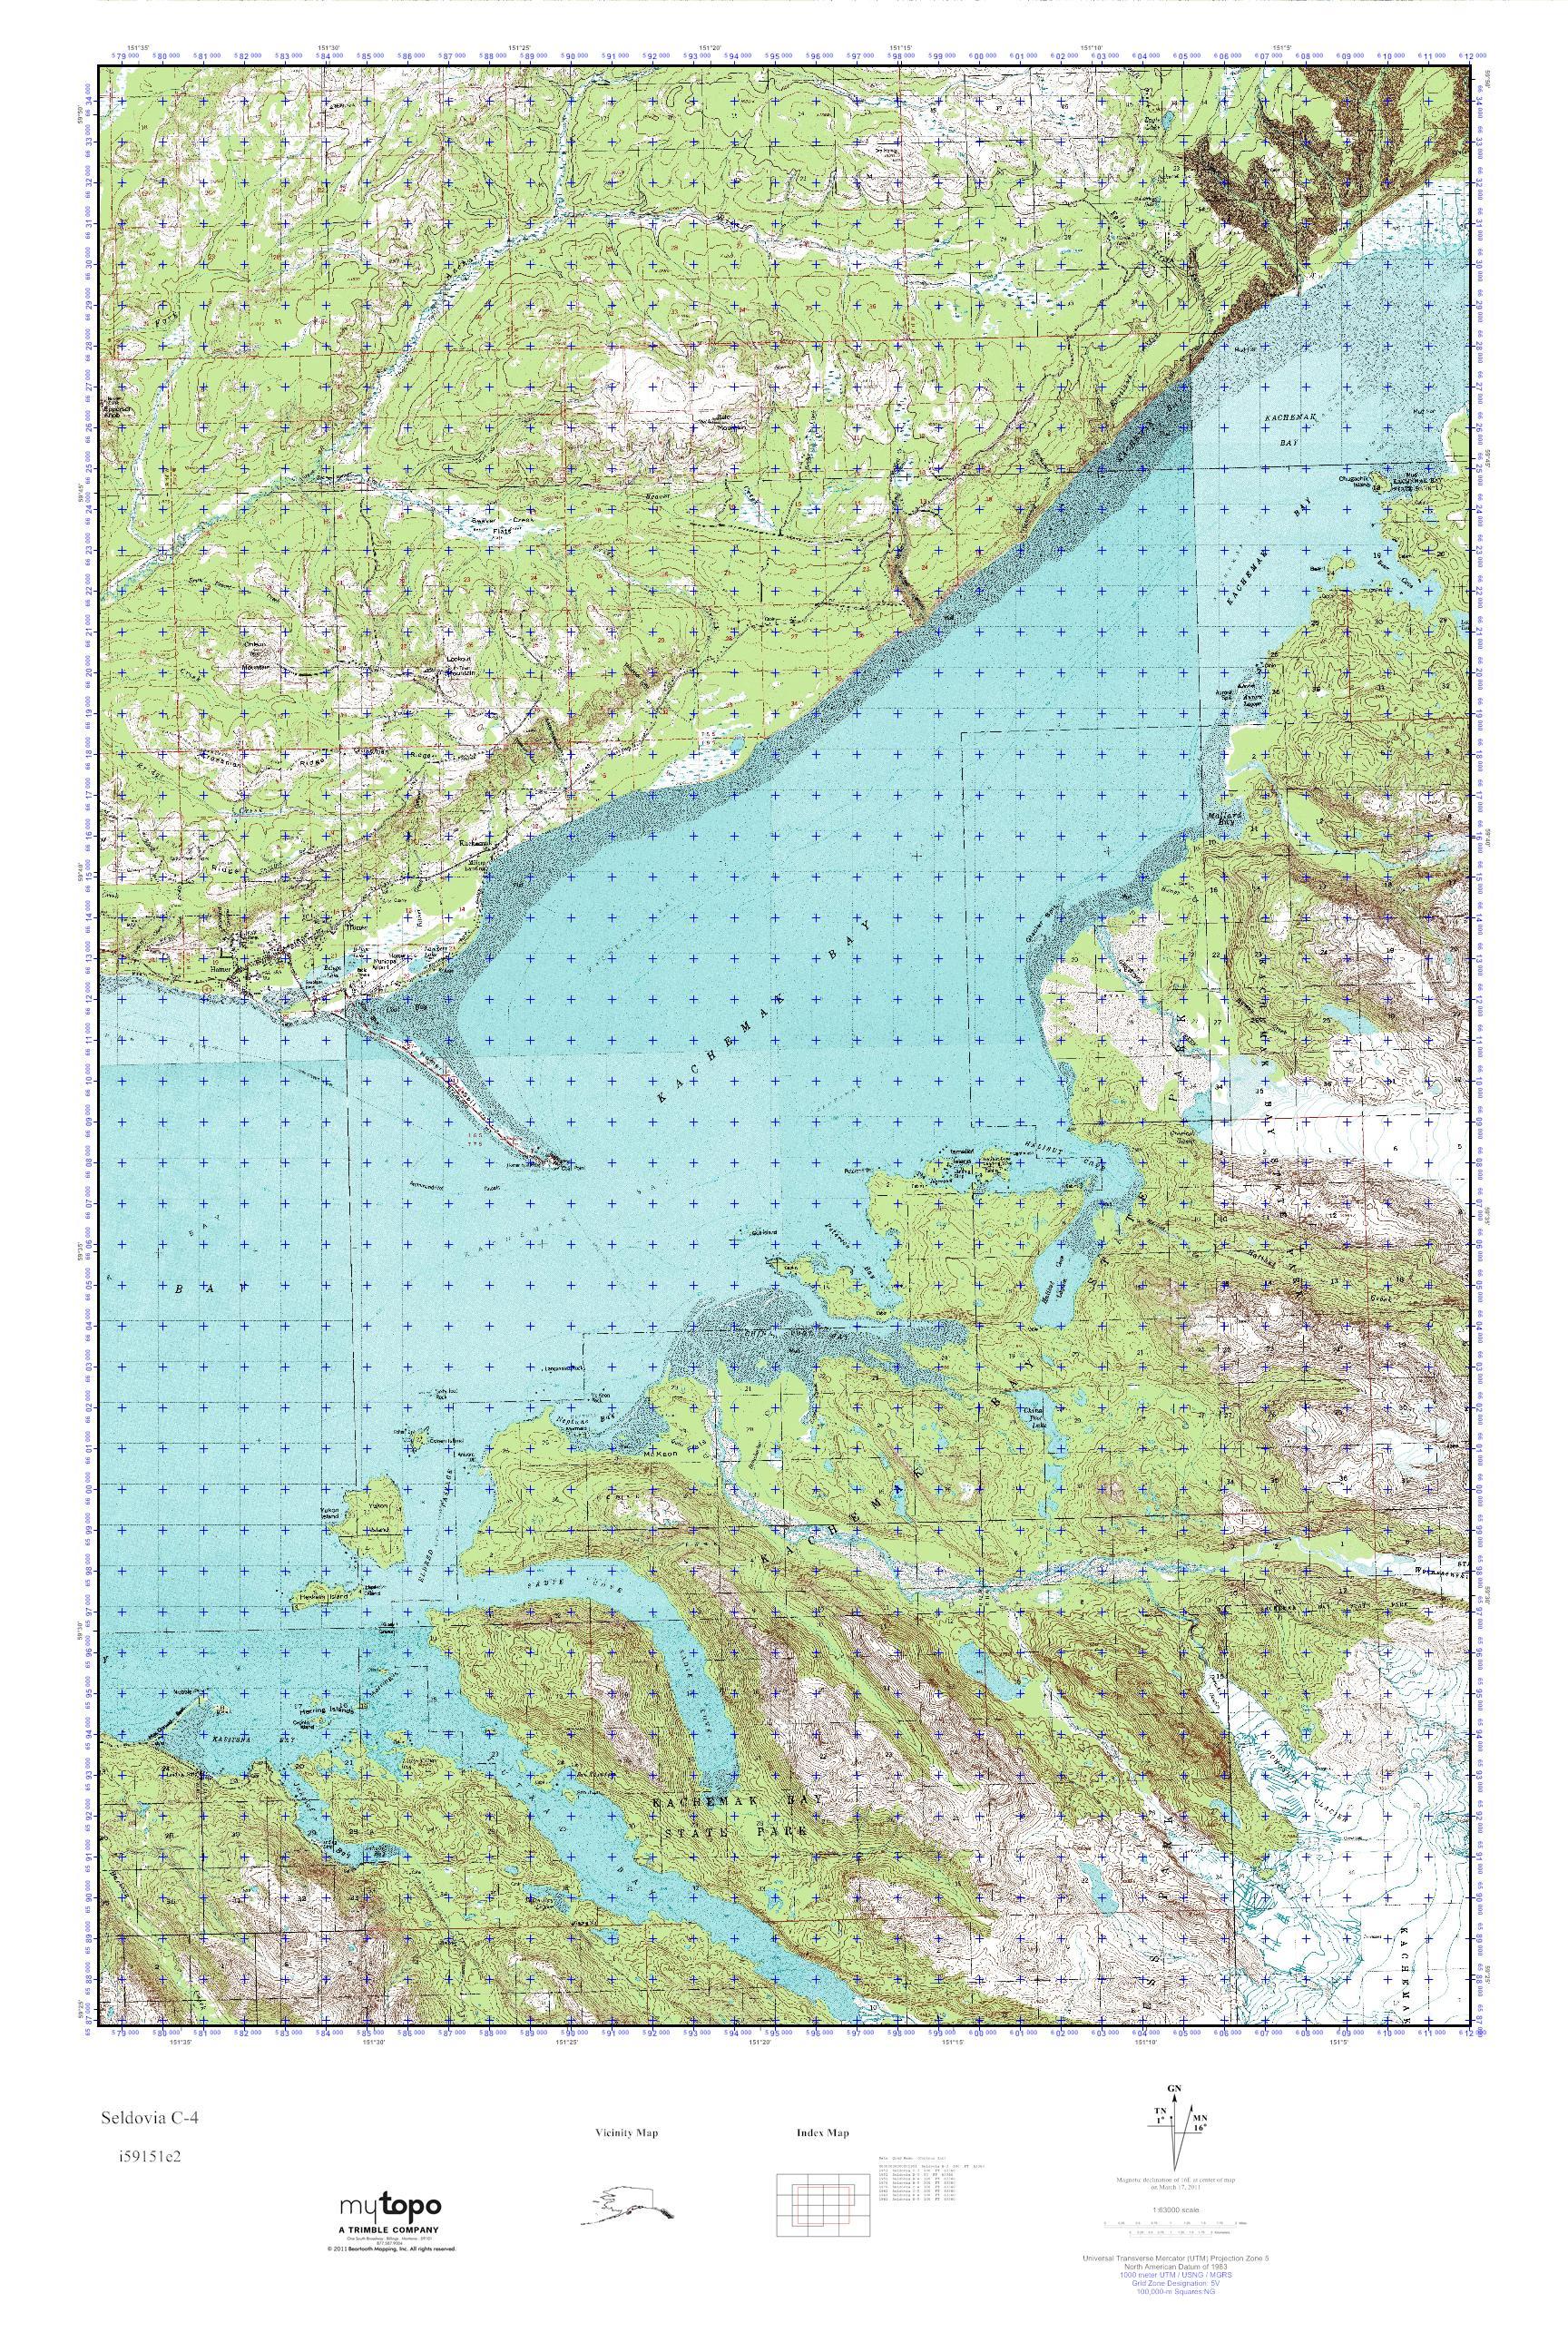 Mytopo Seldovia C 4 Alaska Usgs Quad Topo Map